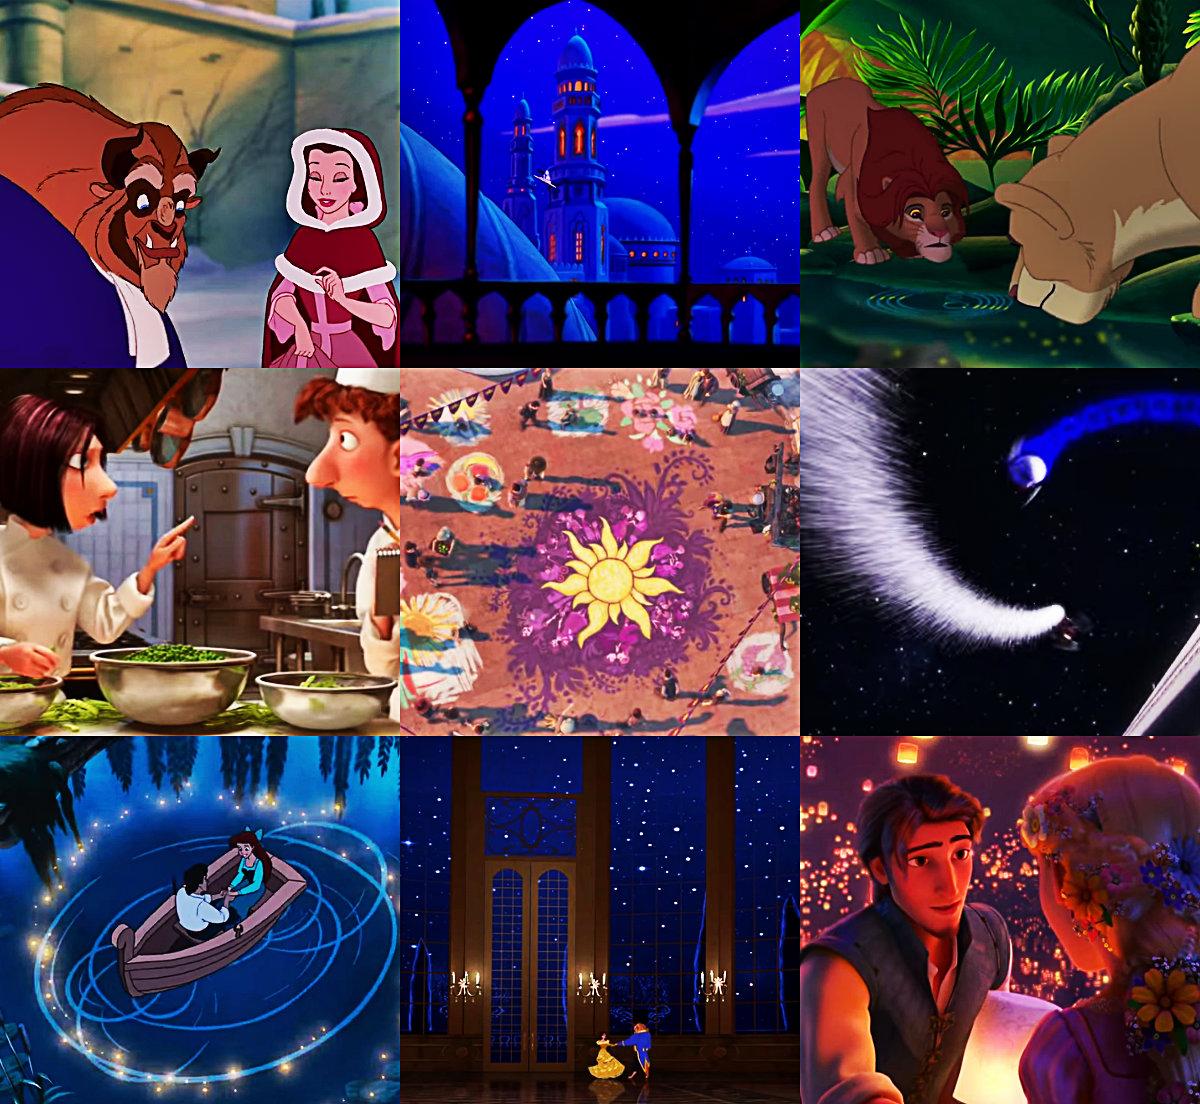 The Dreamy Disney and Pixar Dates